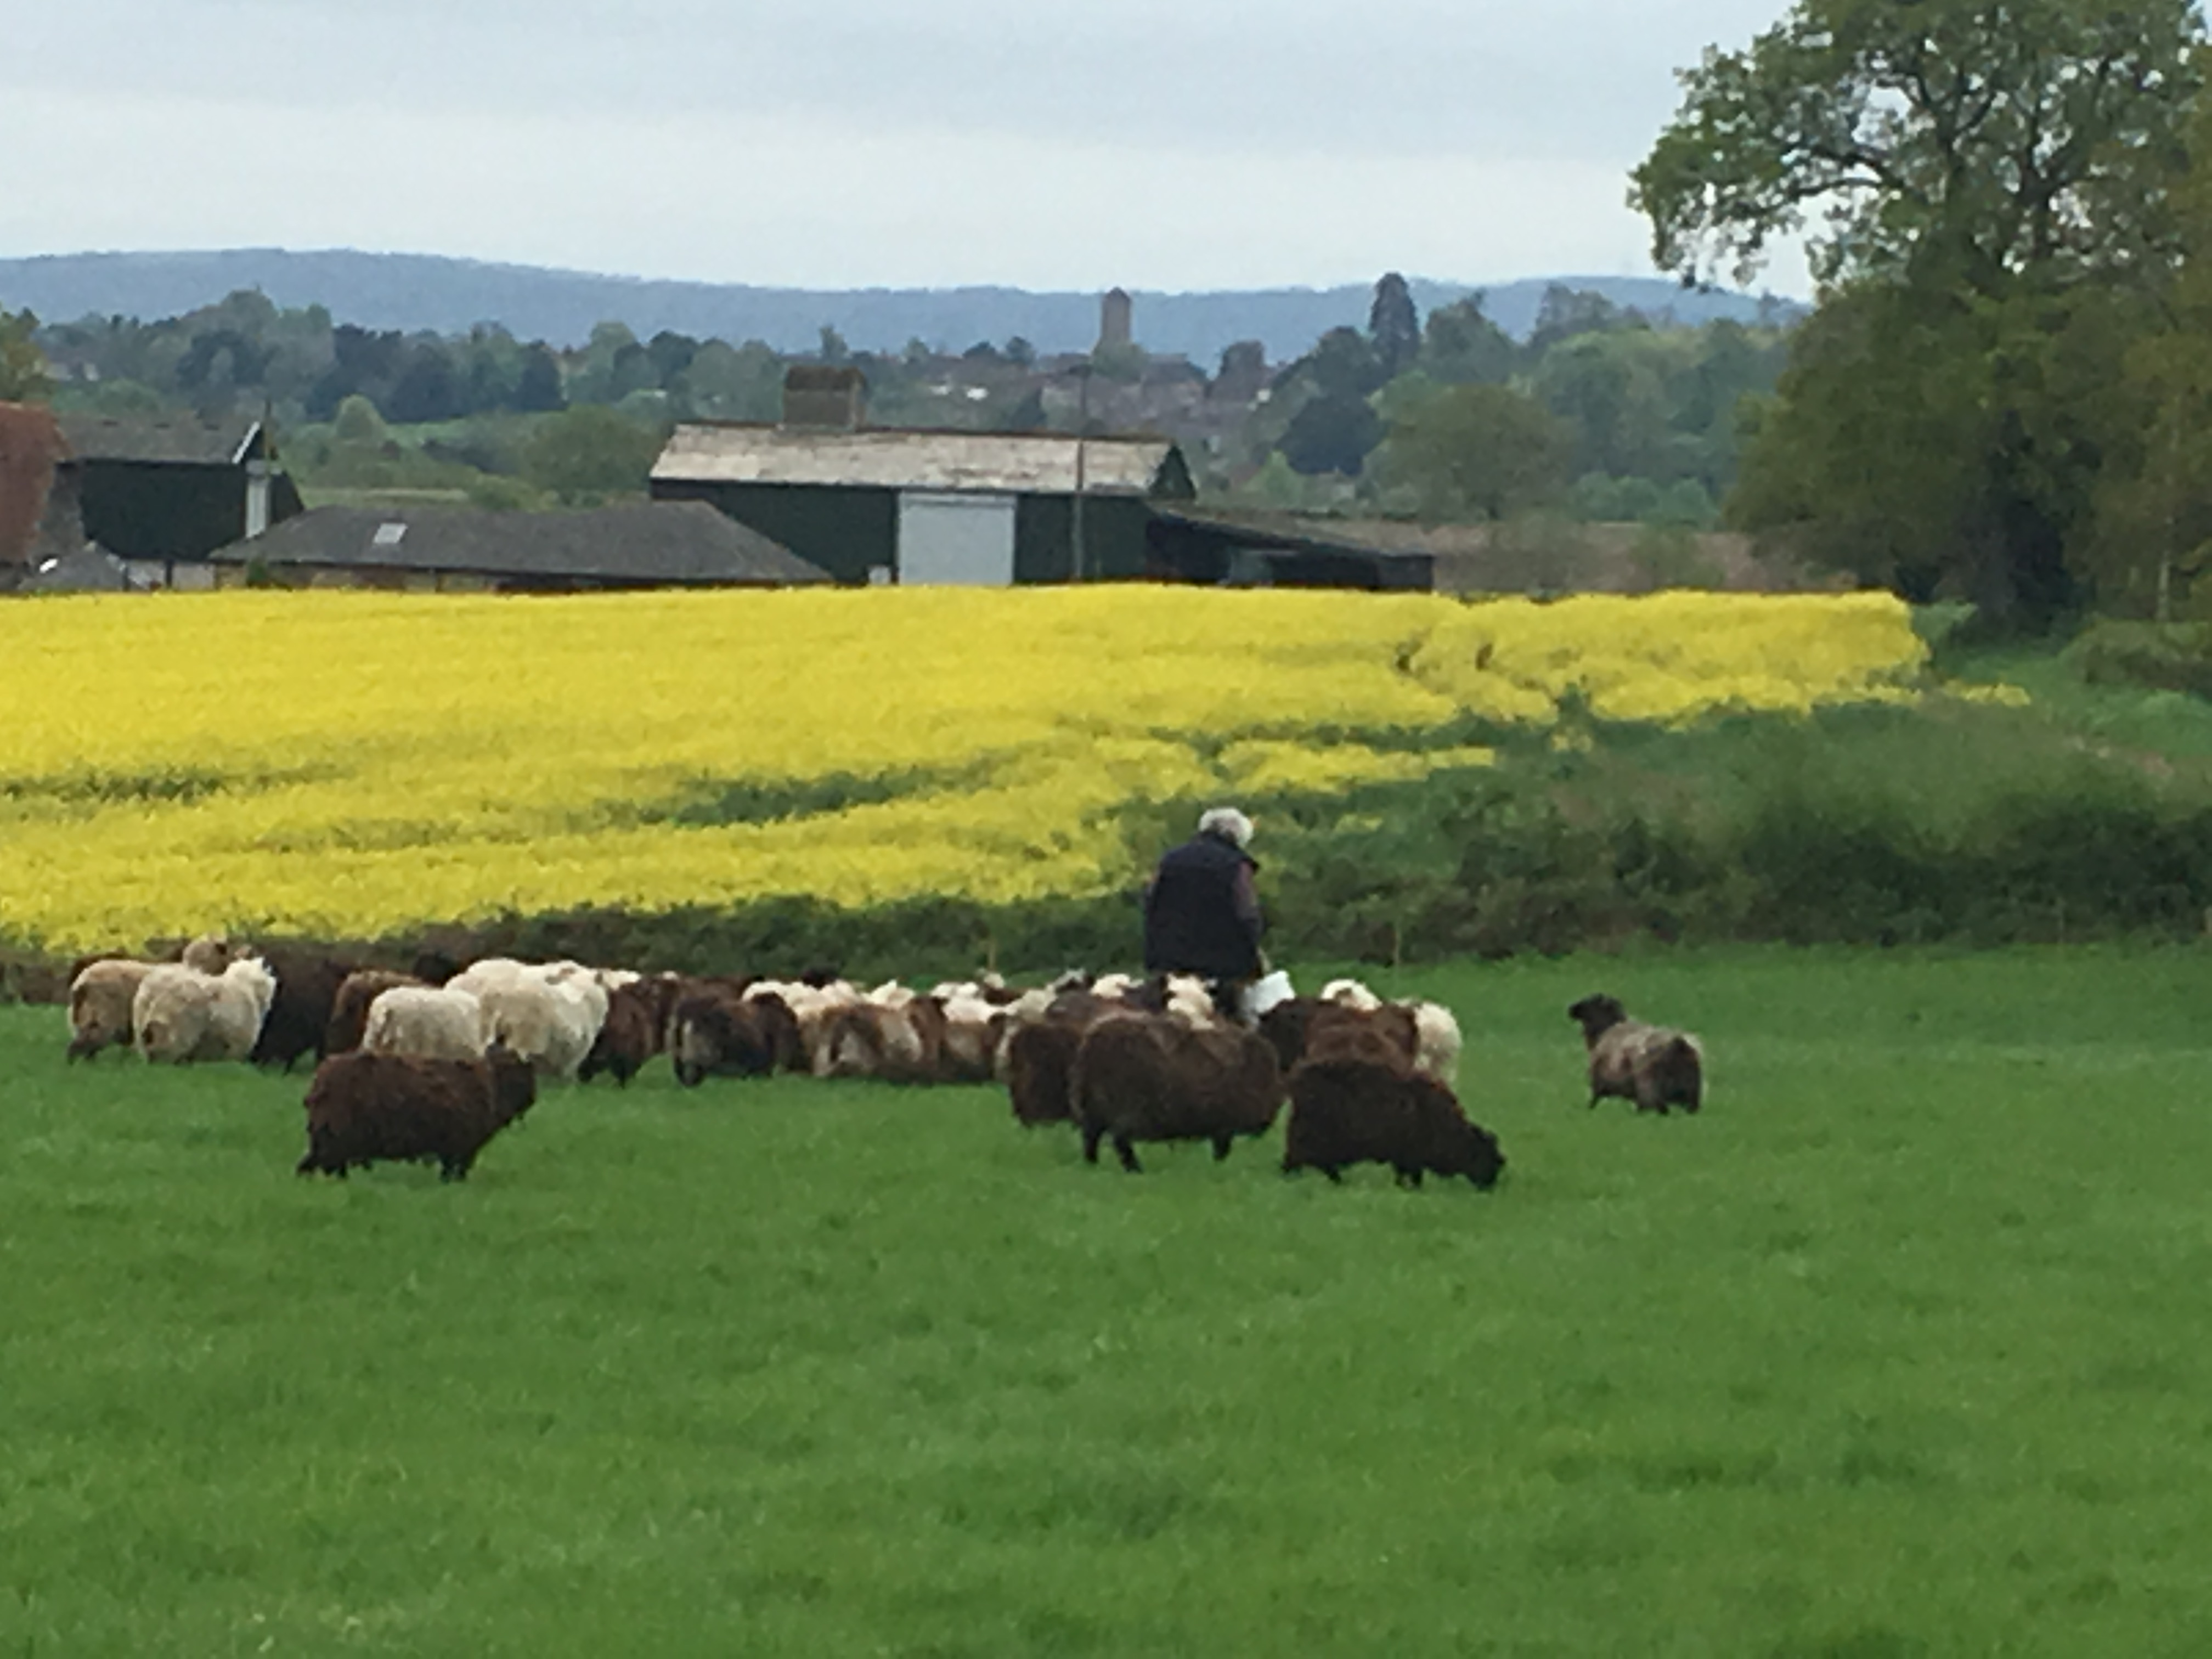 Pete the Sheep Whisperer